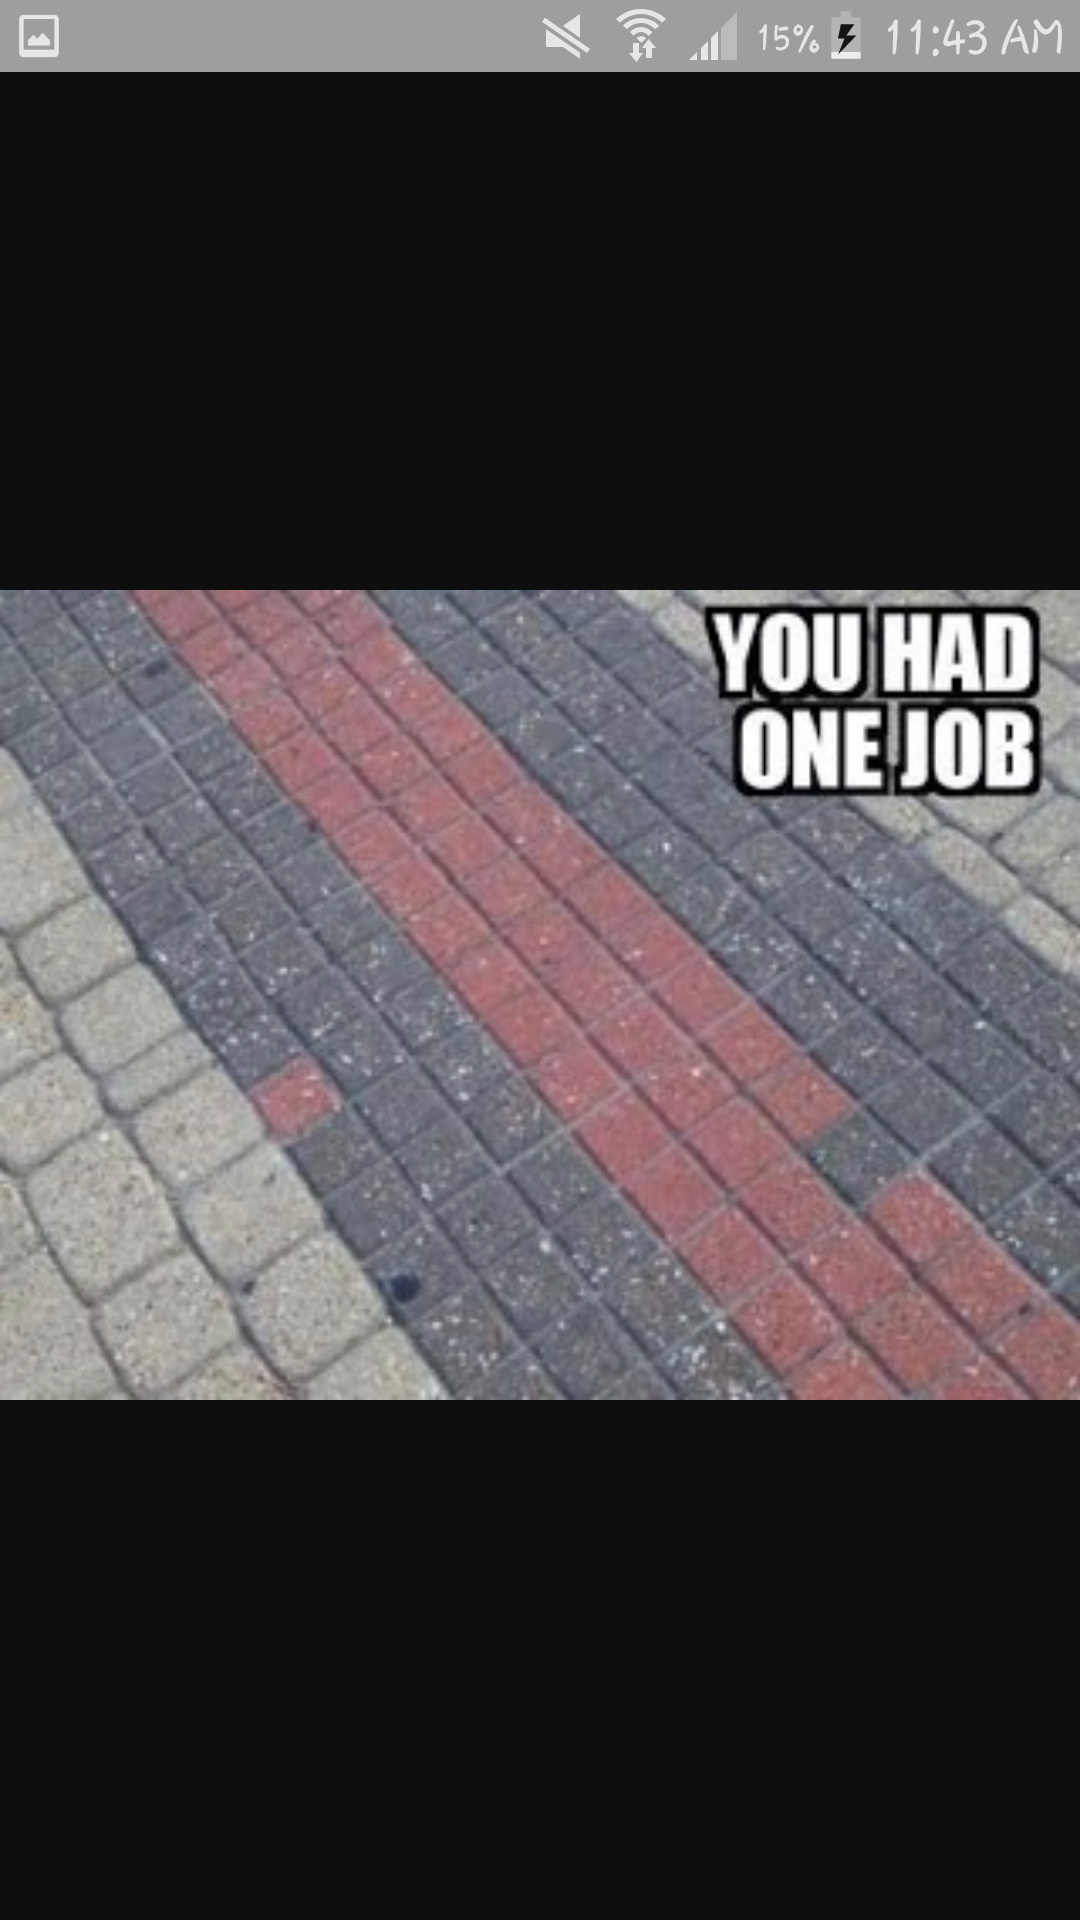 One job sir one job - meme